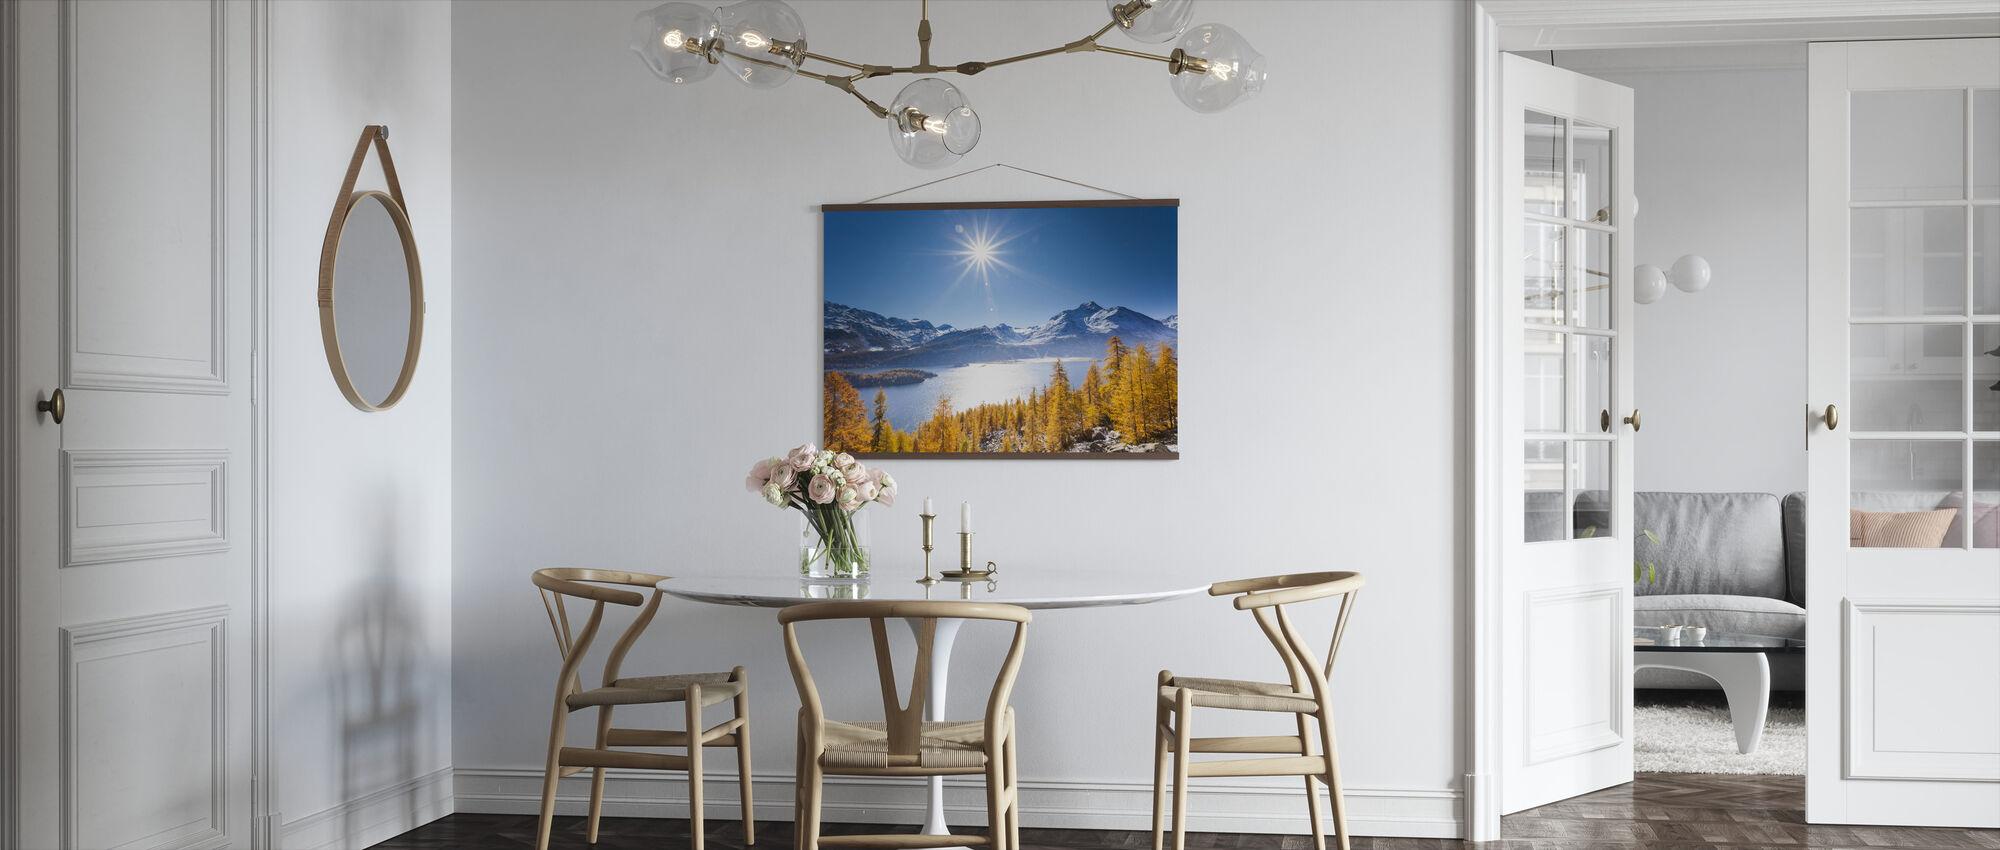 Graubunden, Zwitserland - Poster - Keuken